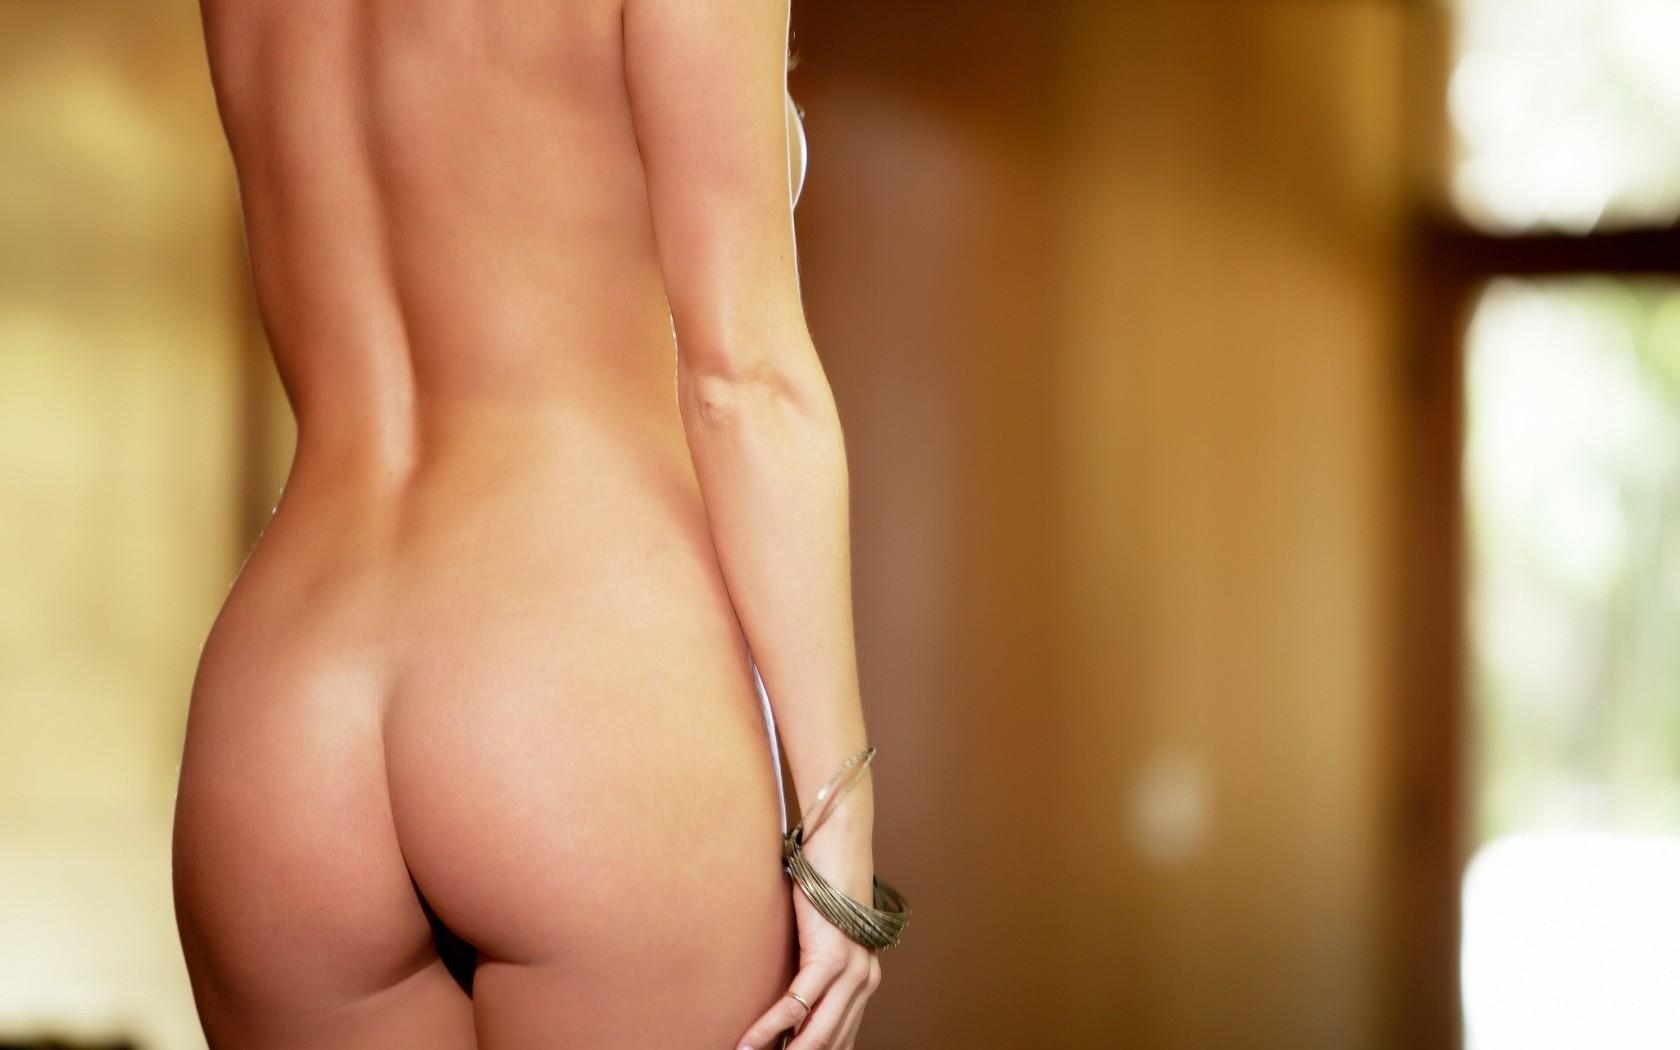 Free Asshole Porn Pics and Asshole Pictures - SEXCOM